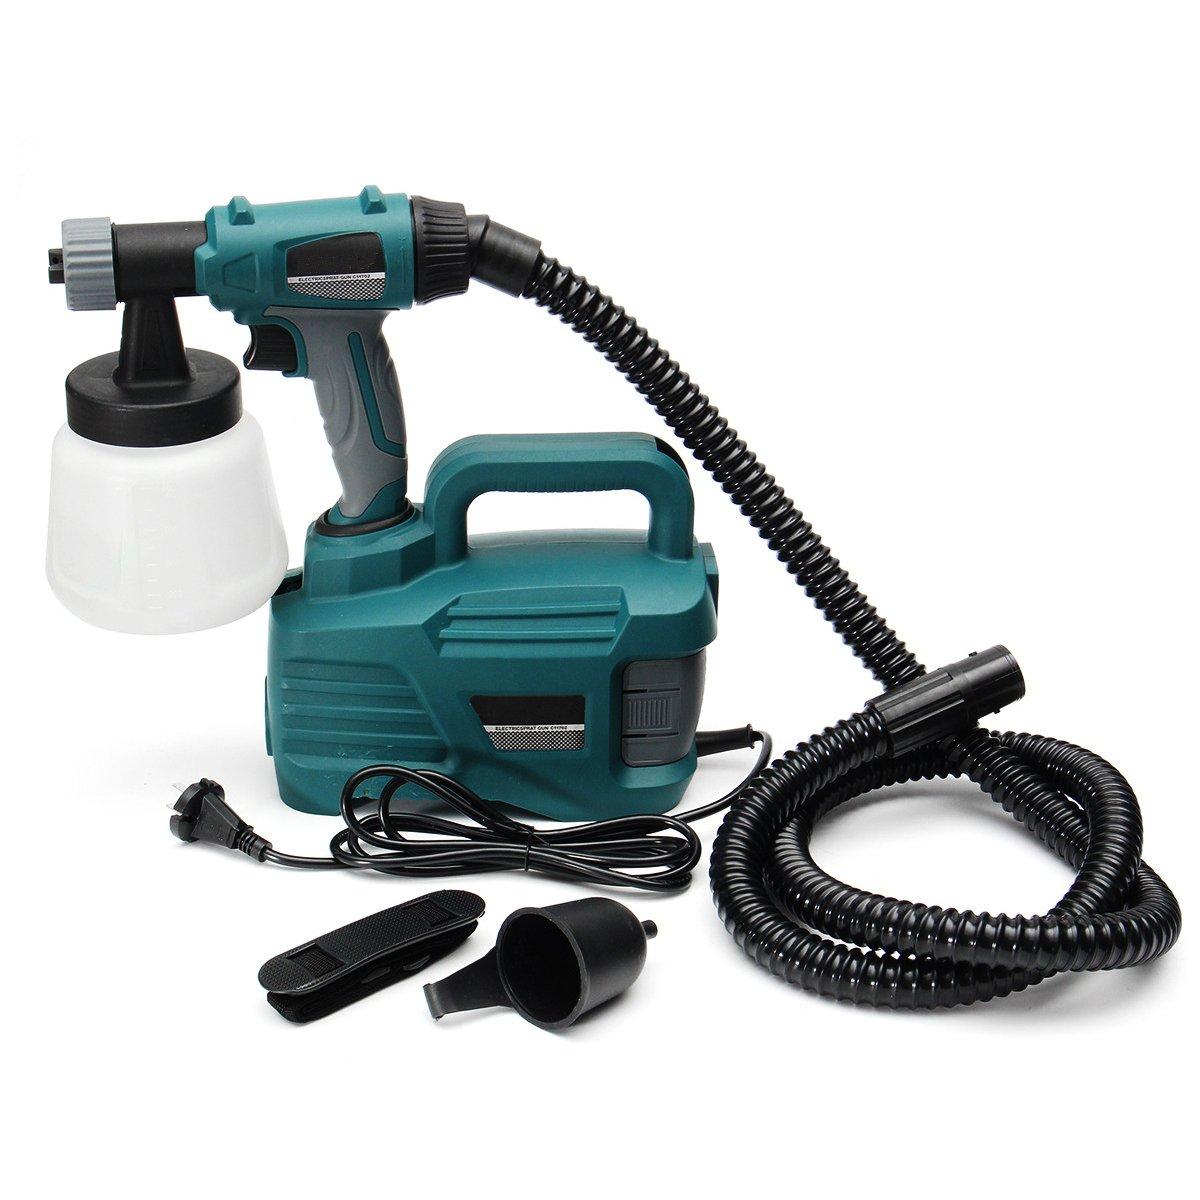 800W 900ML Electric Painter Gun Spray Latex Paint Sprayer House Painting Machine by Ologymart (Image #5)